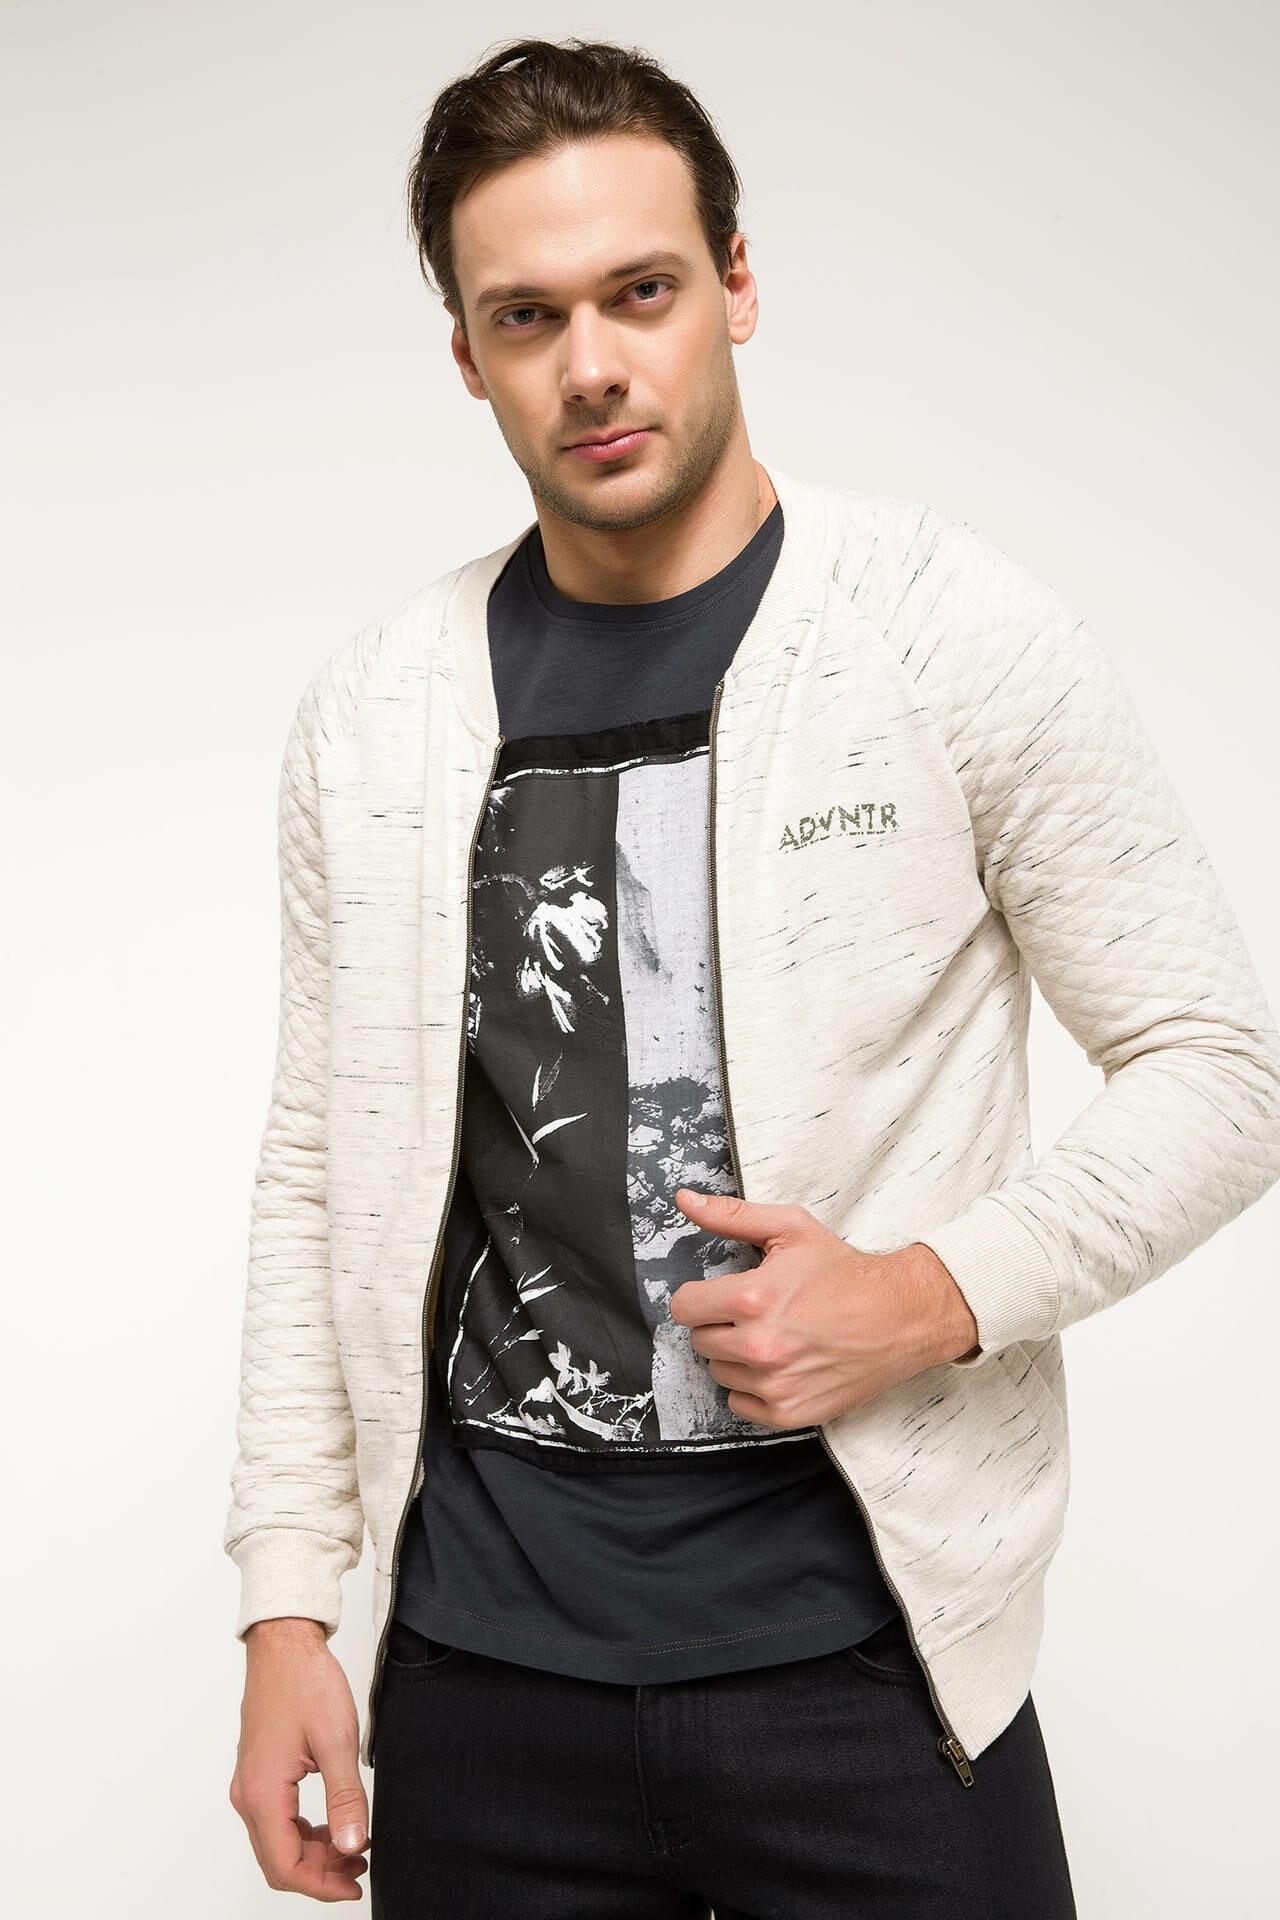 Defacto Sweater Cardigan Top-Cloth Bolero Knitted Long-Sleeve Zipper Autumn Men Mens